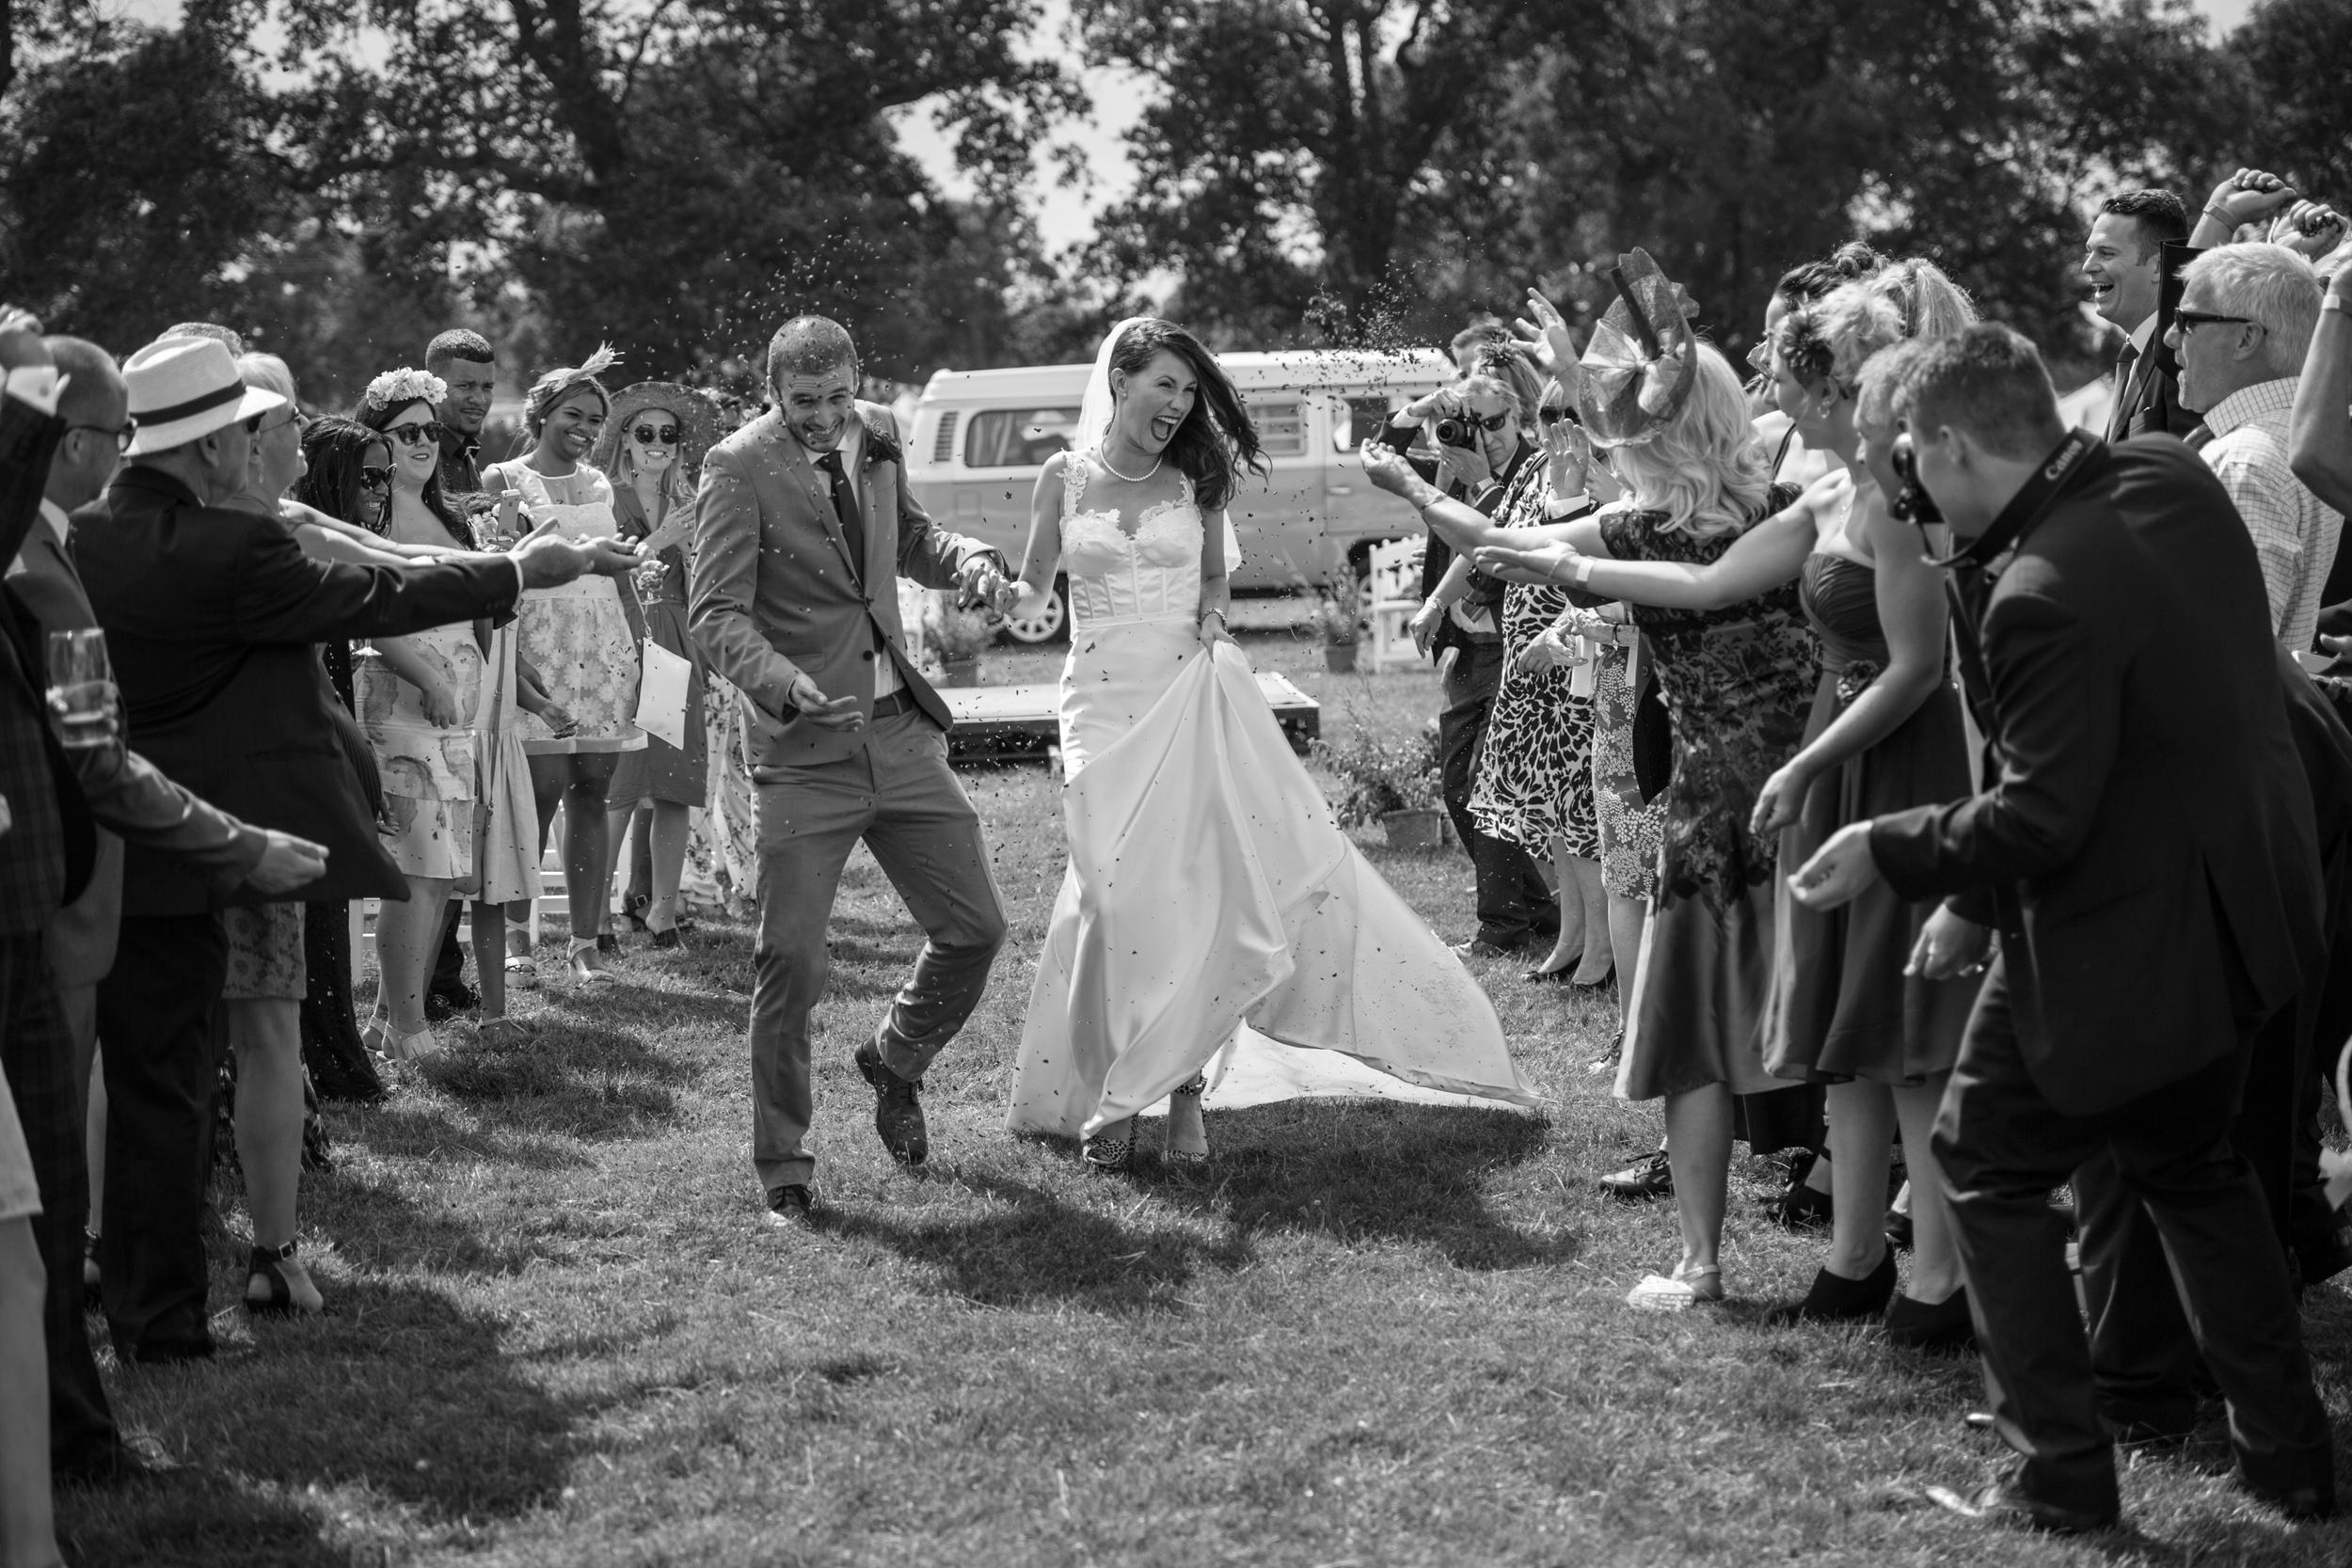 Buckinghamshire Wedding Photography - Sarah & Brad